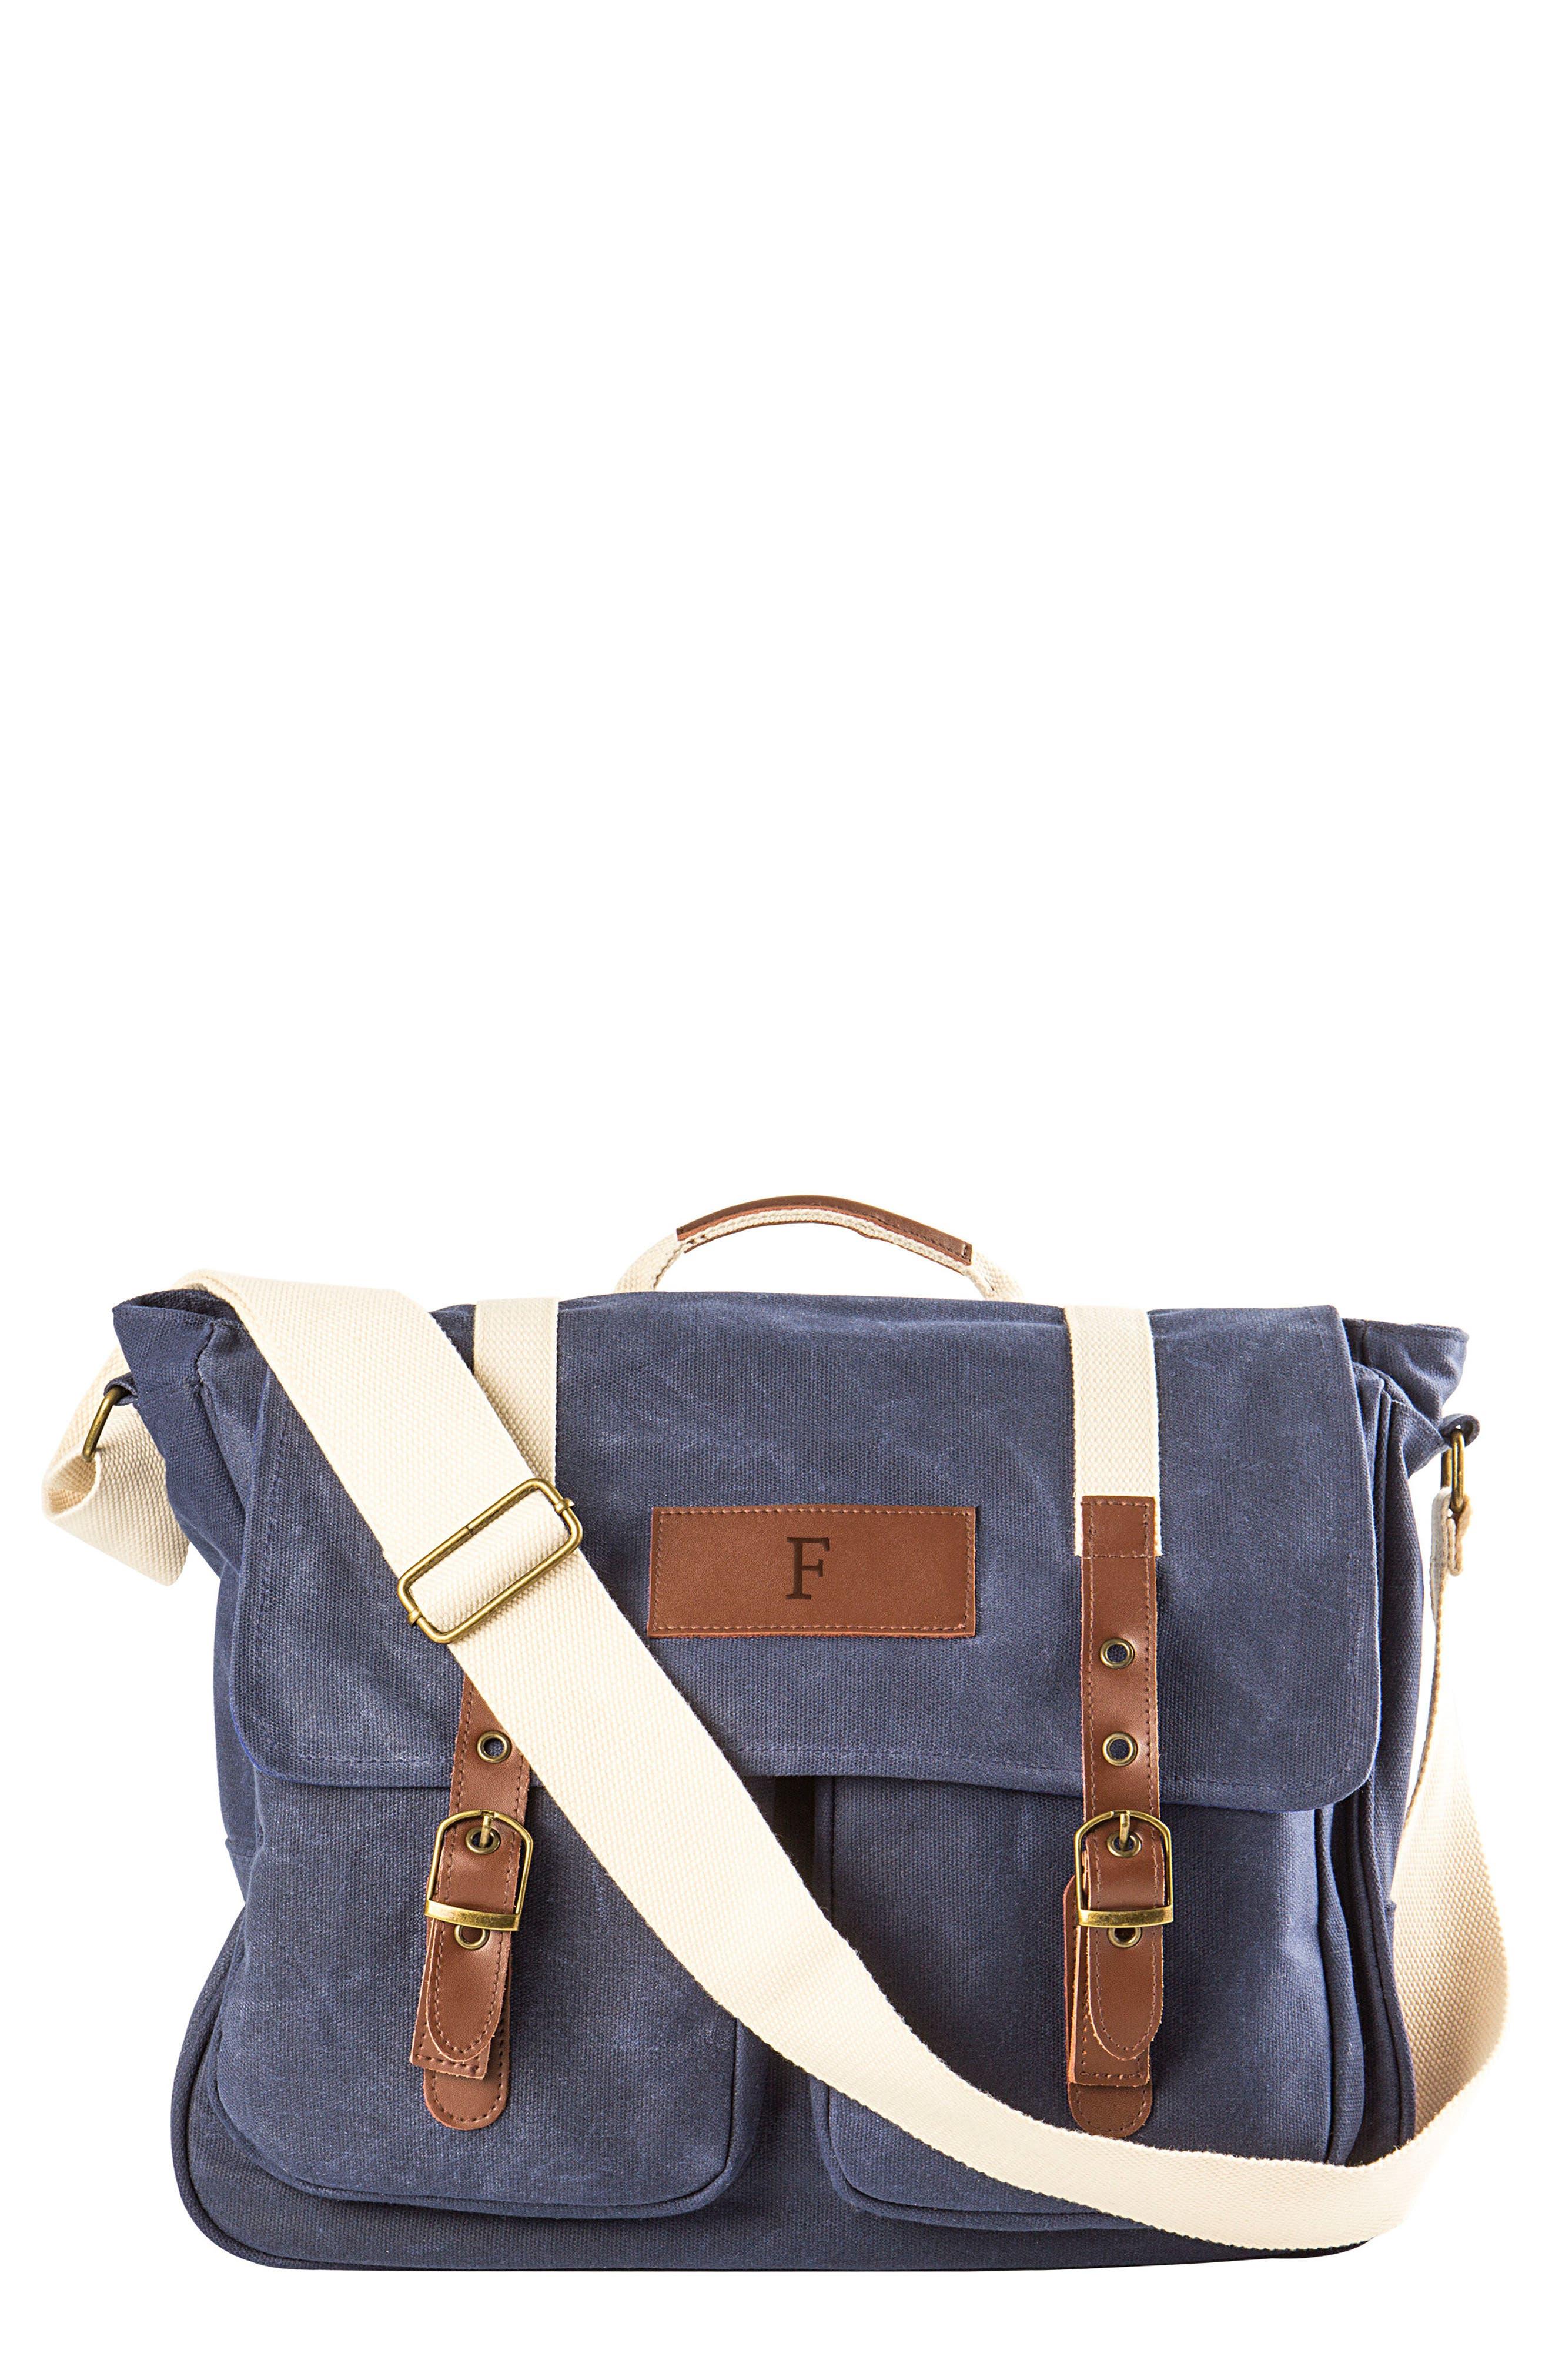 Monogram Messenger Bag,                         Main,                         color, NAVY-F